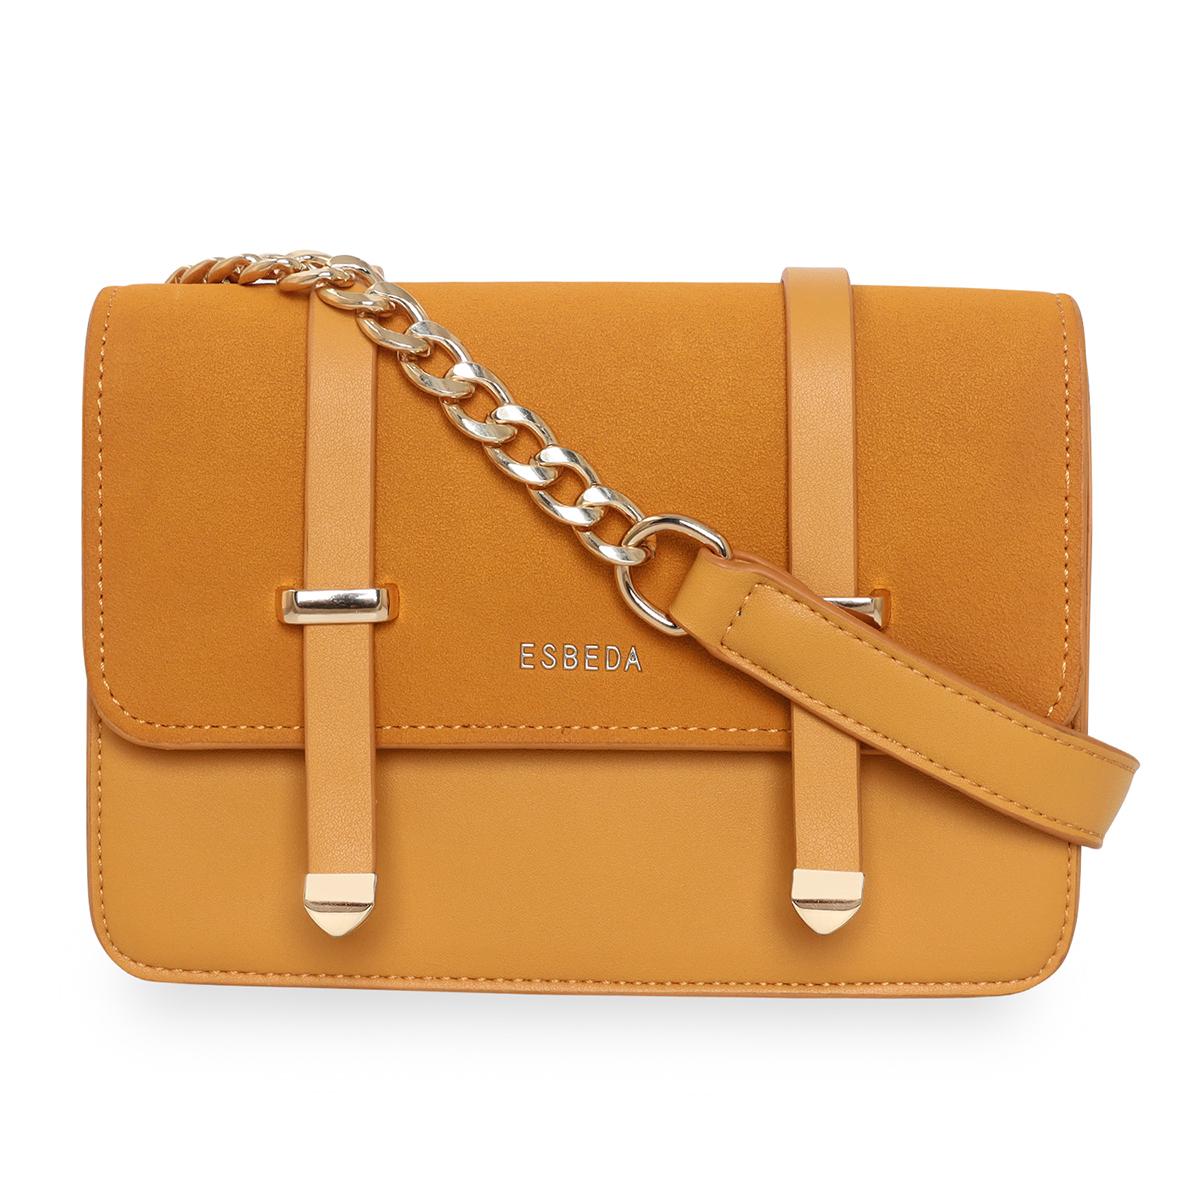 ESBEDA | ESBEDA Mustard  Color Solid Pattern Crossbody Box Sling Bag For Women